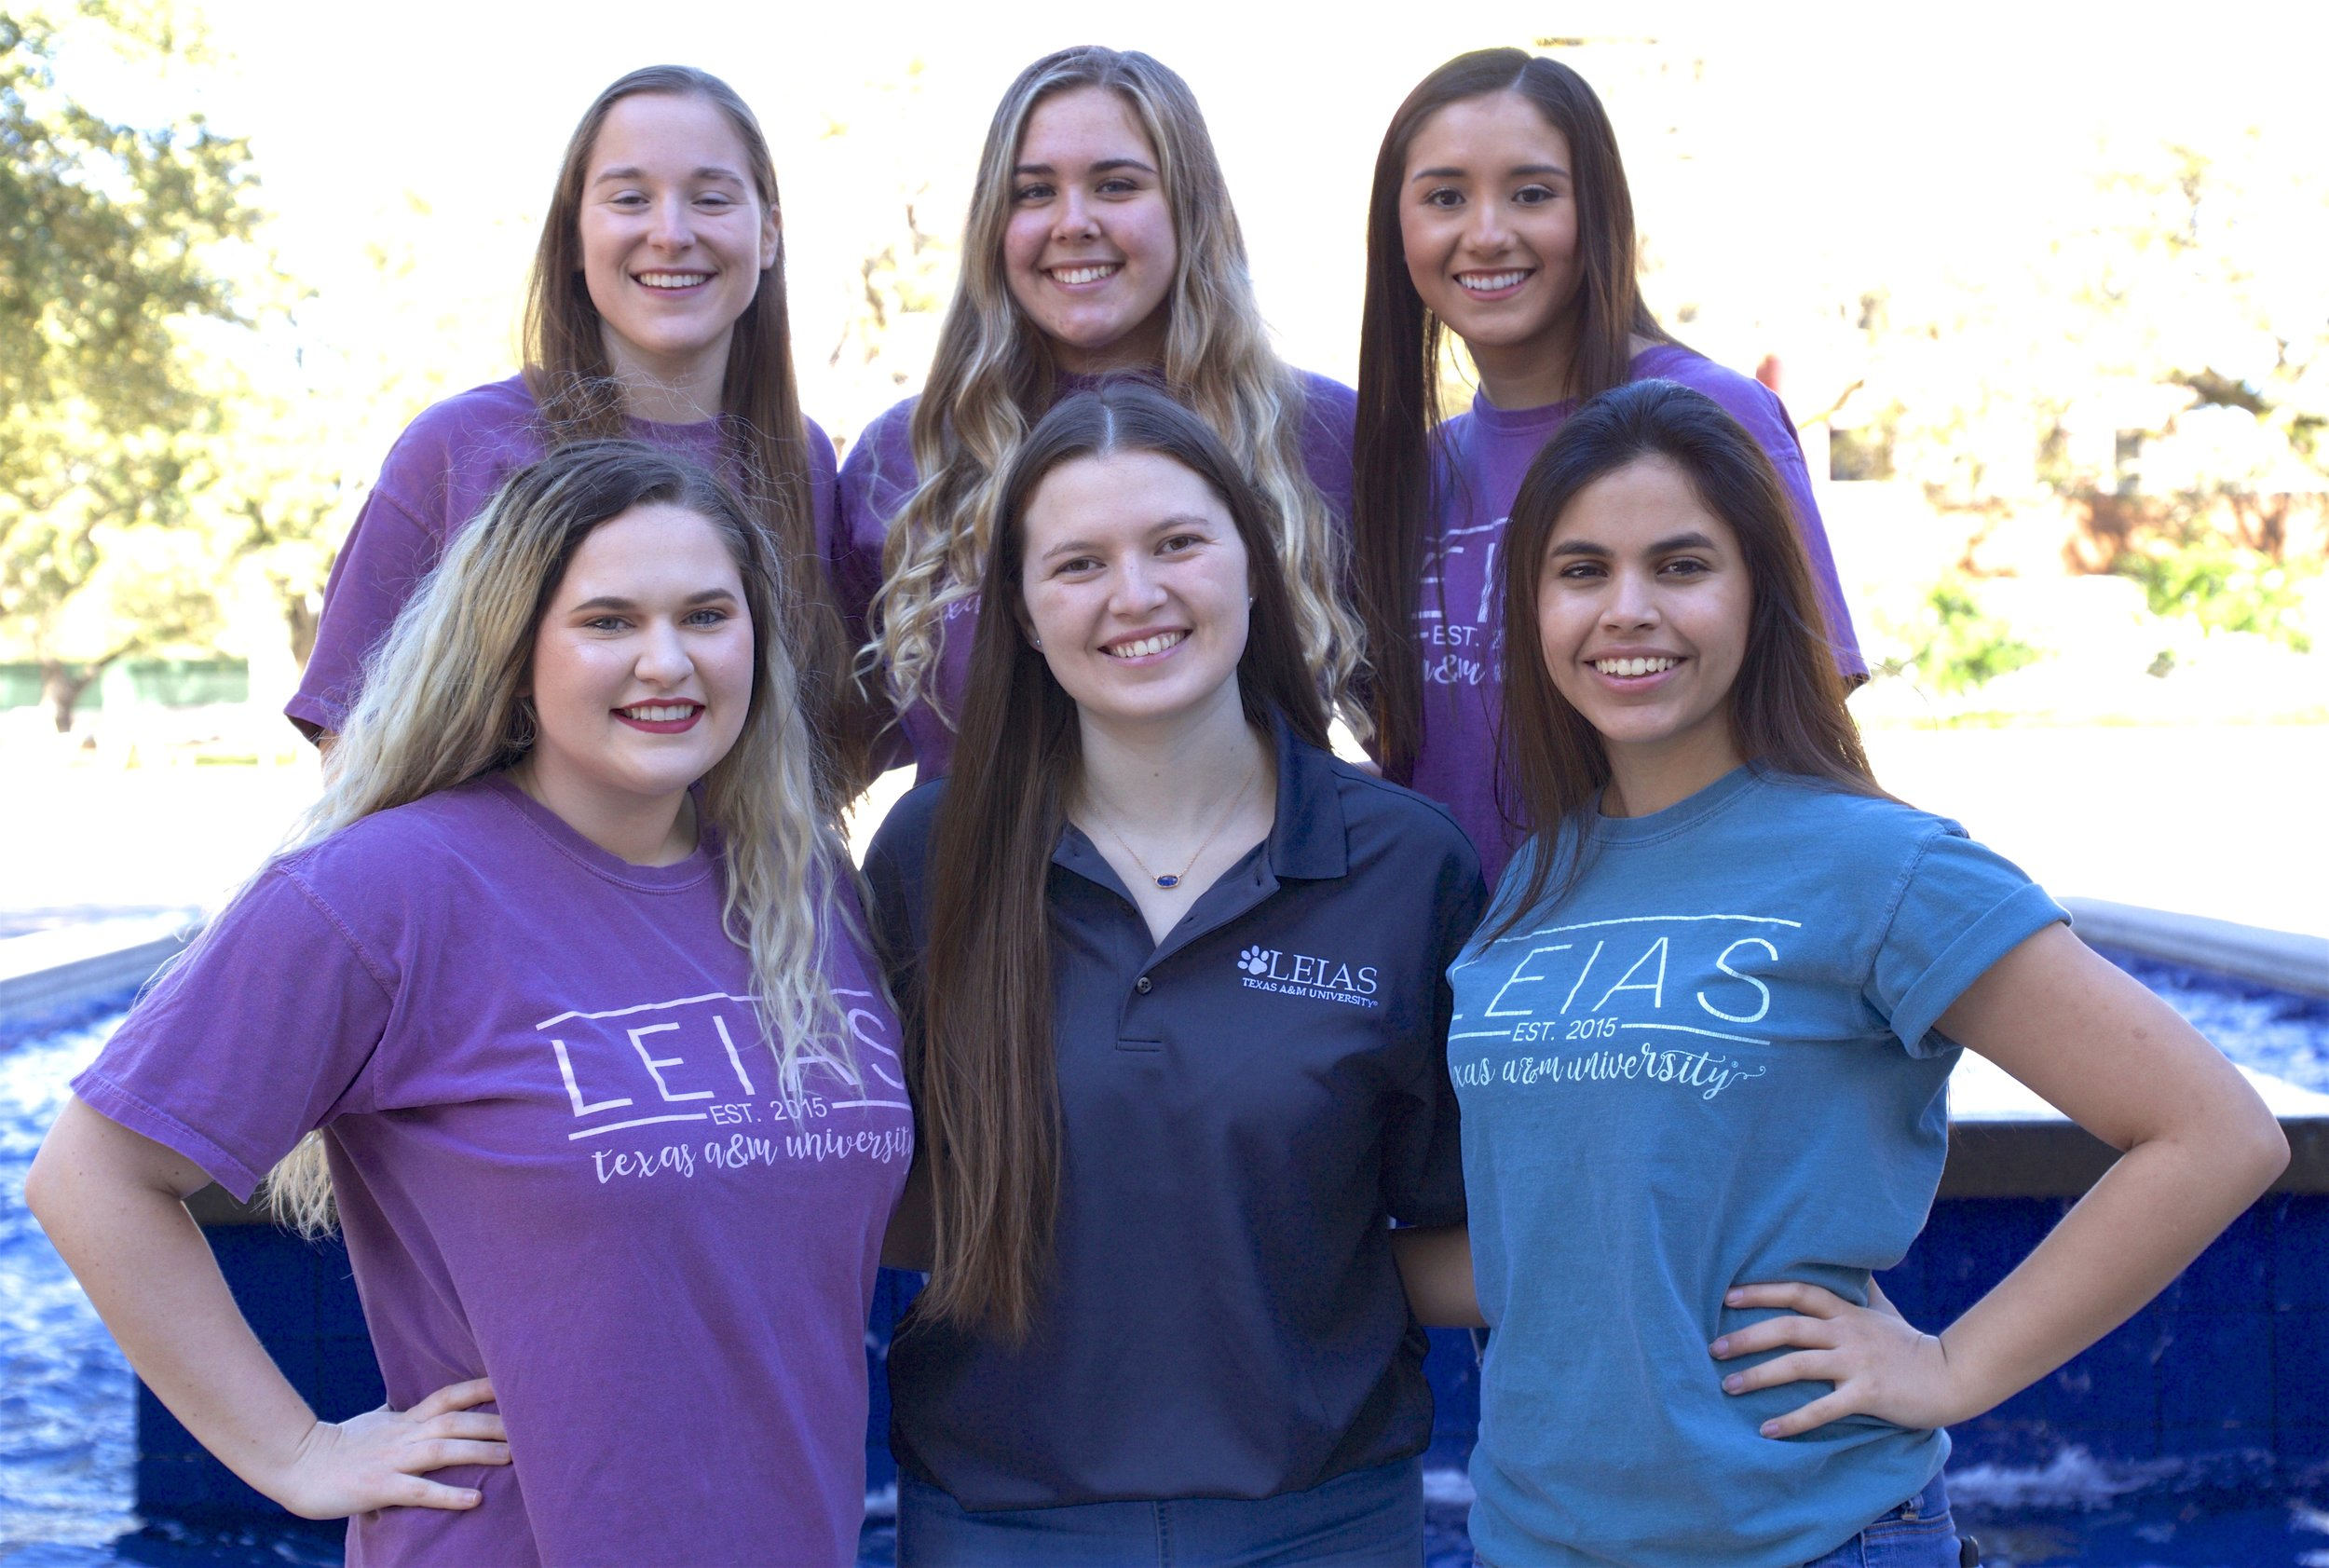 Service - Beth Briscoe, Emma Sardella, Lizeth Parra, Robin Horne, Ashley Morris, Paola Perez-Loera